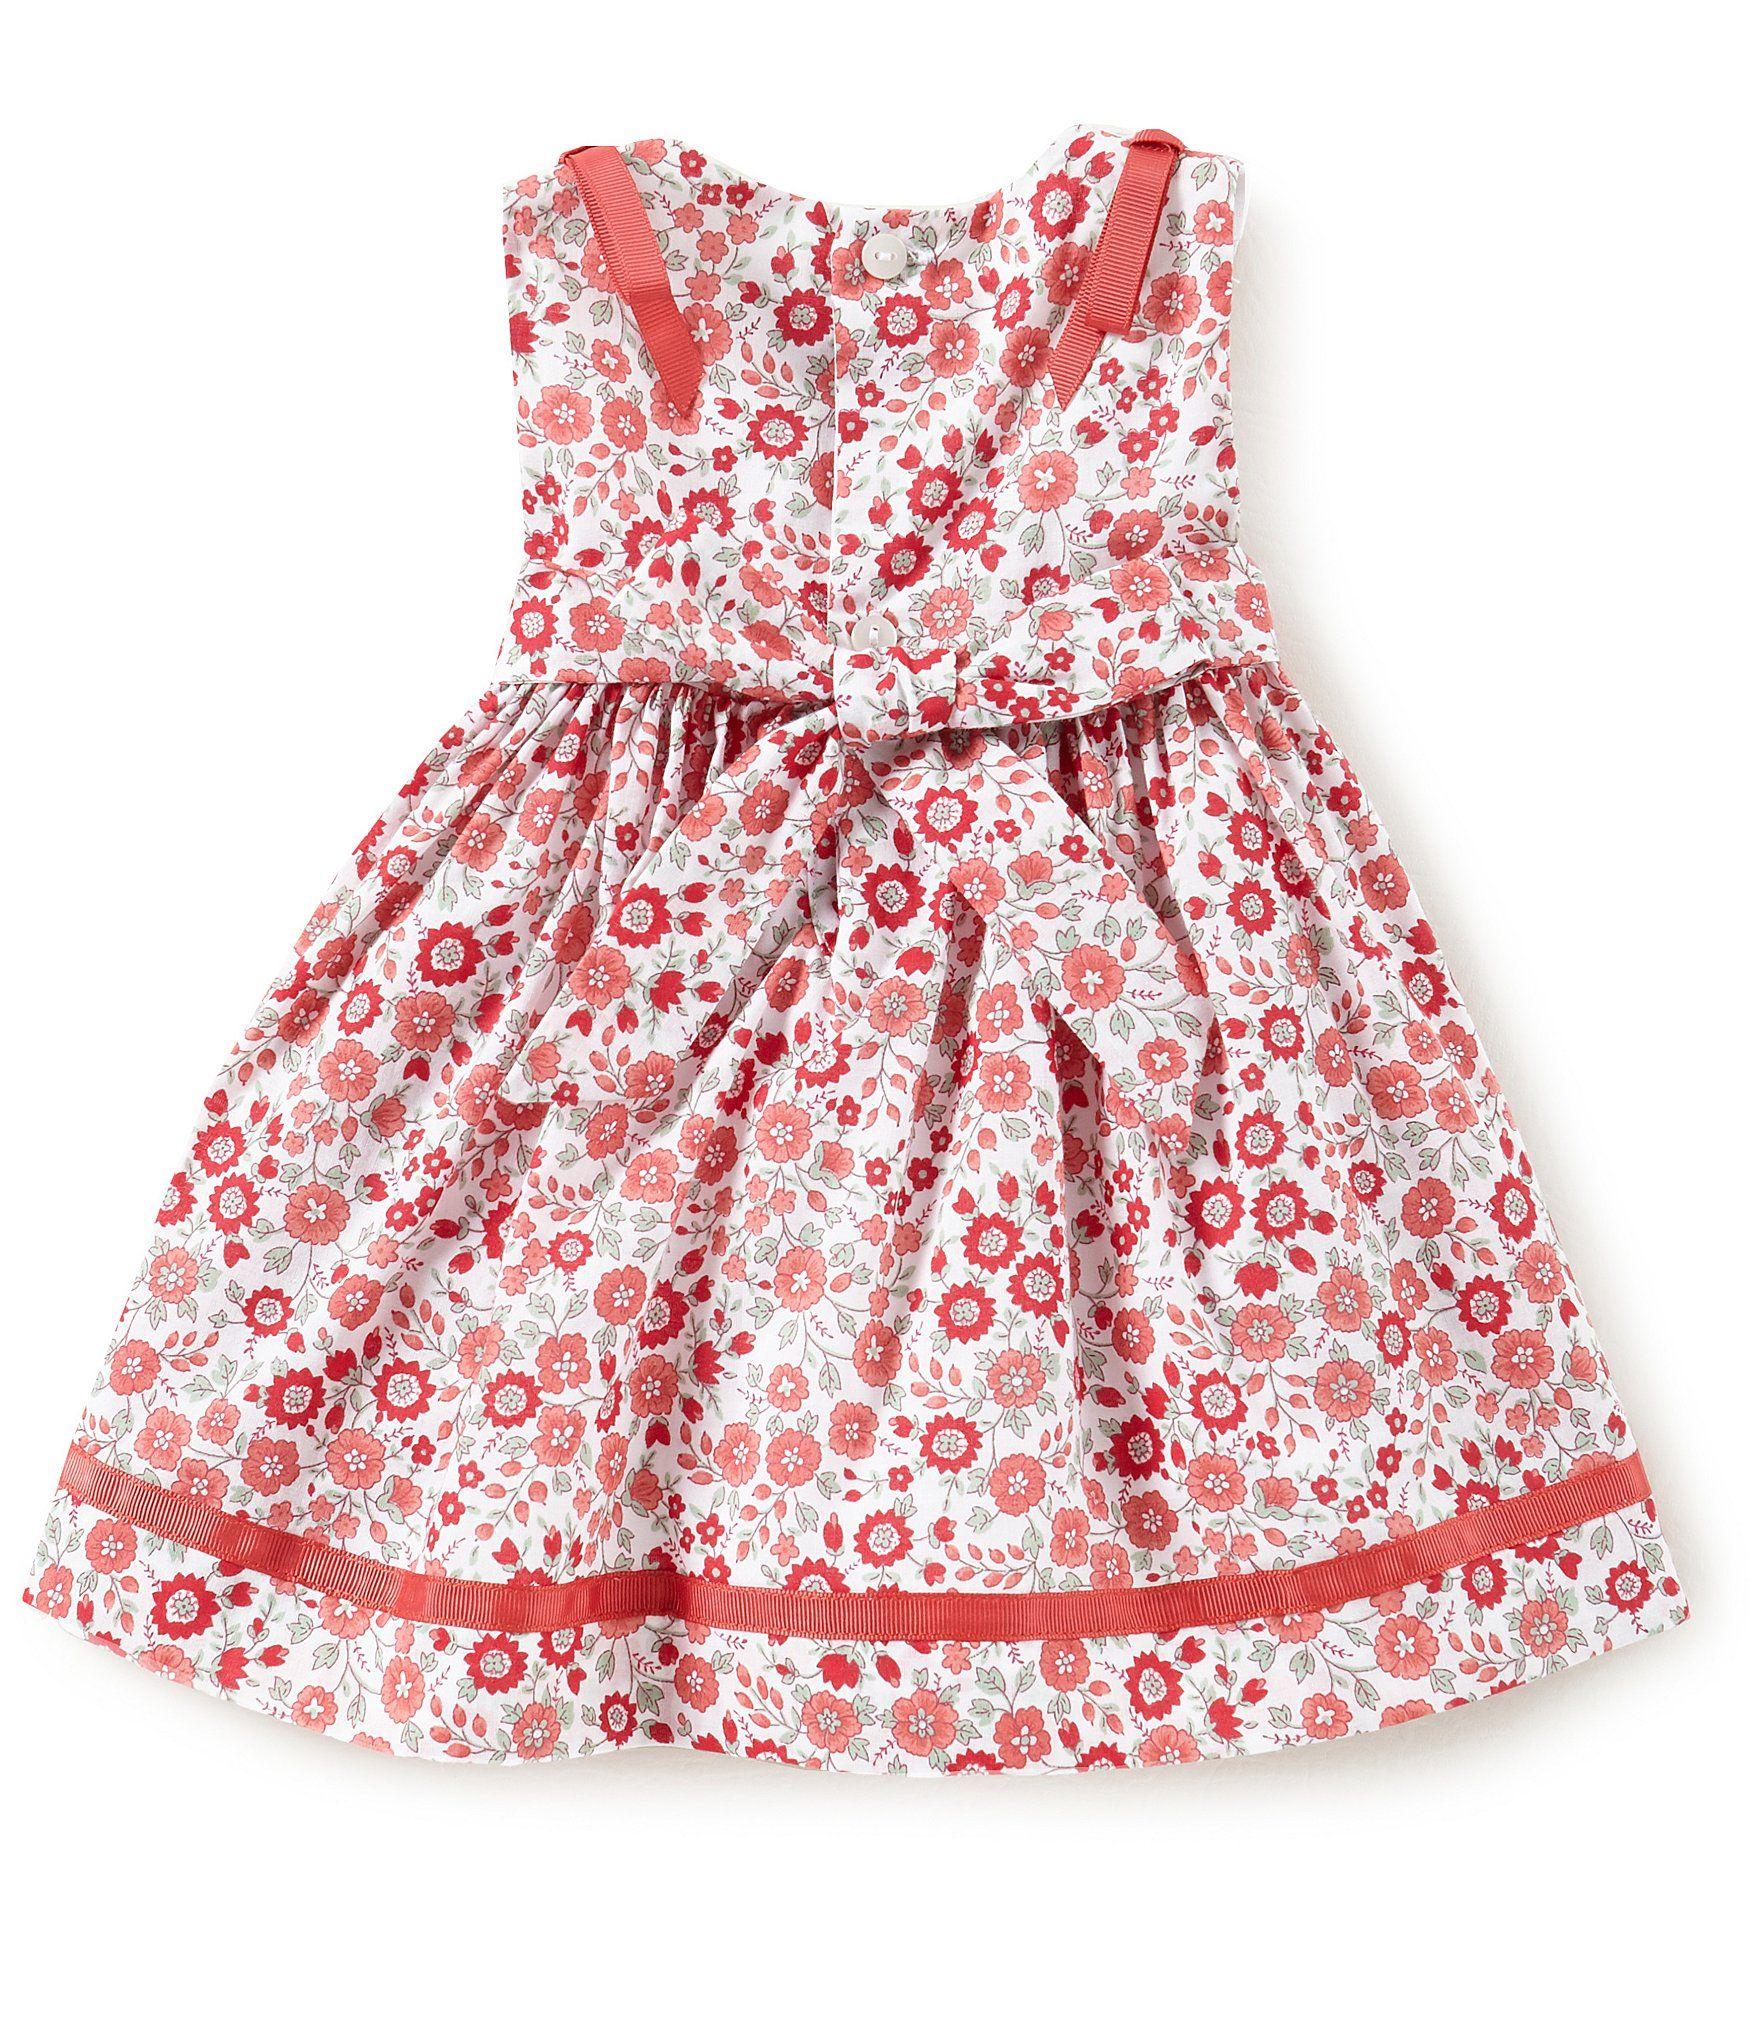 d6b34860da9 Shop for Edgehill Collection Baby Girls 3-24 Months Floral-Print Dress at  Dillards.com. Visit Dillards.com to find clothing